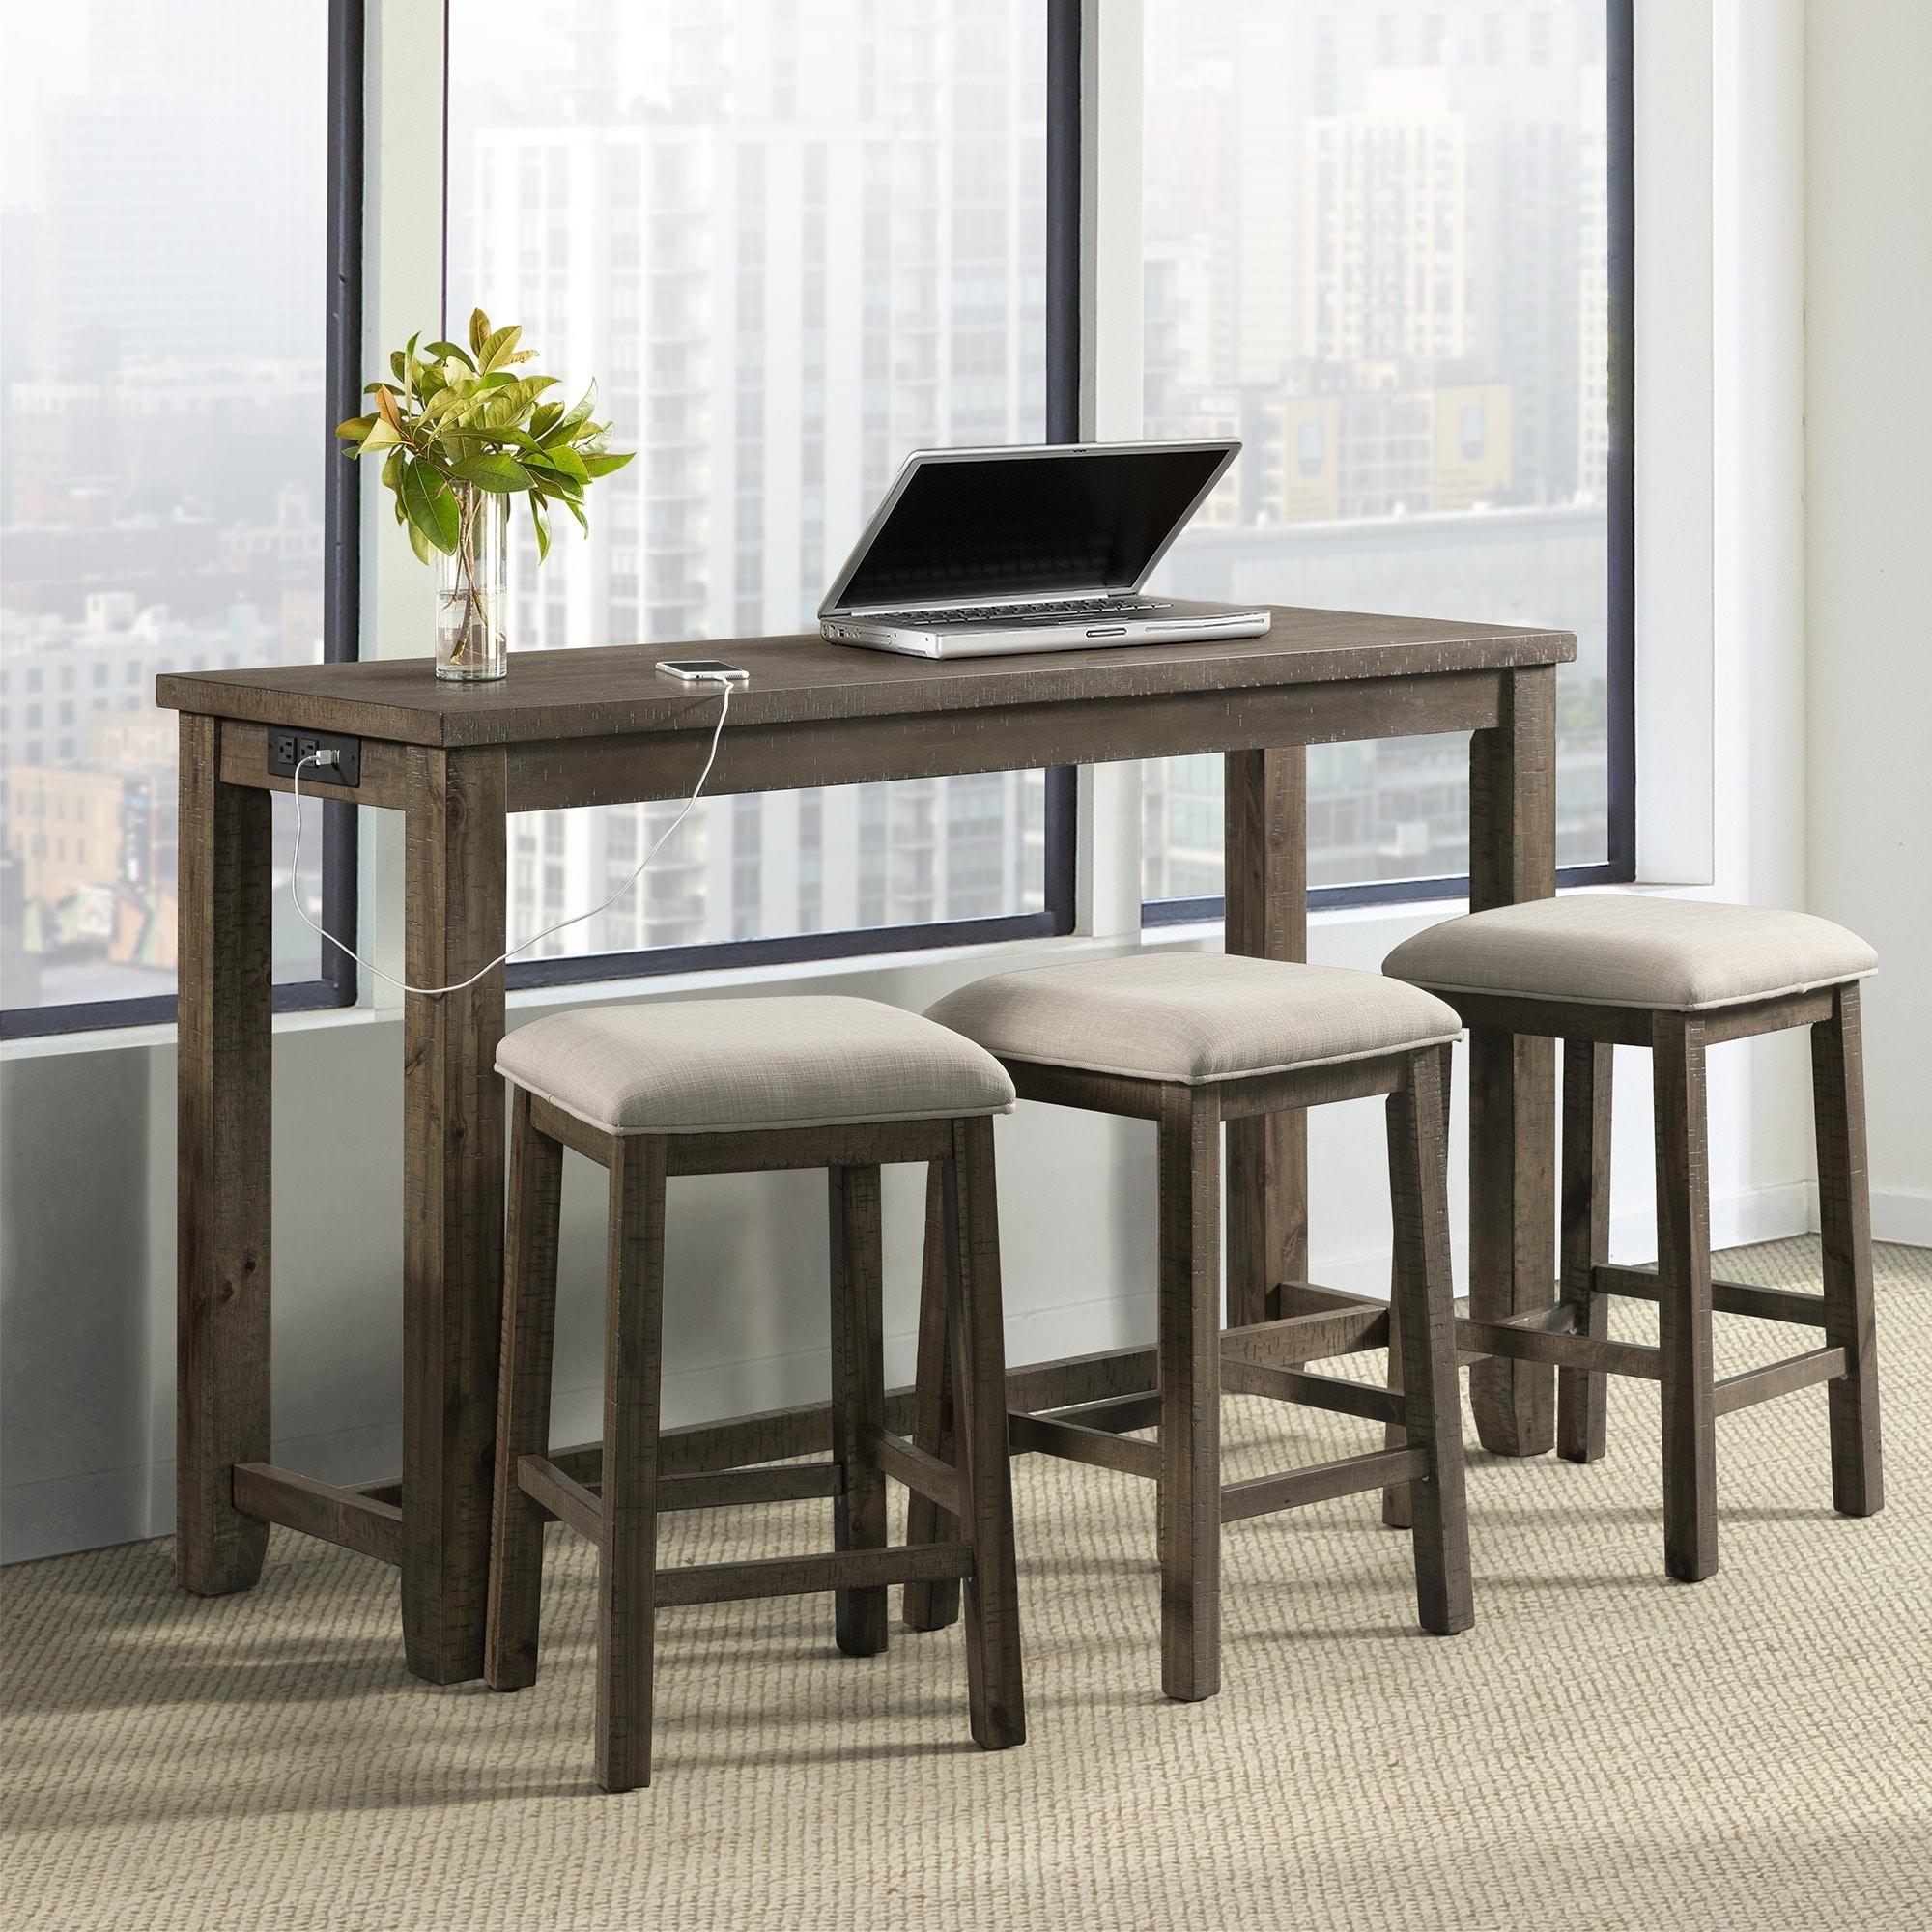 Ordinaire Picket House Furnishings Stanford Multipurpose Bar Table Set